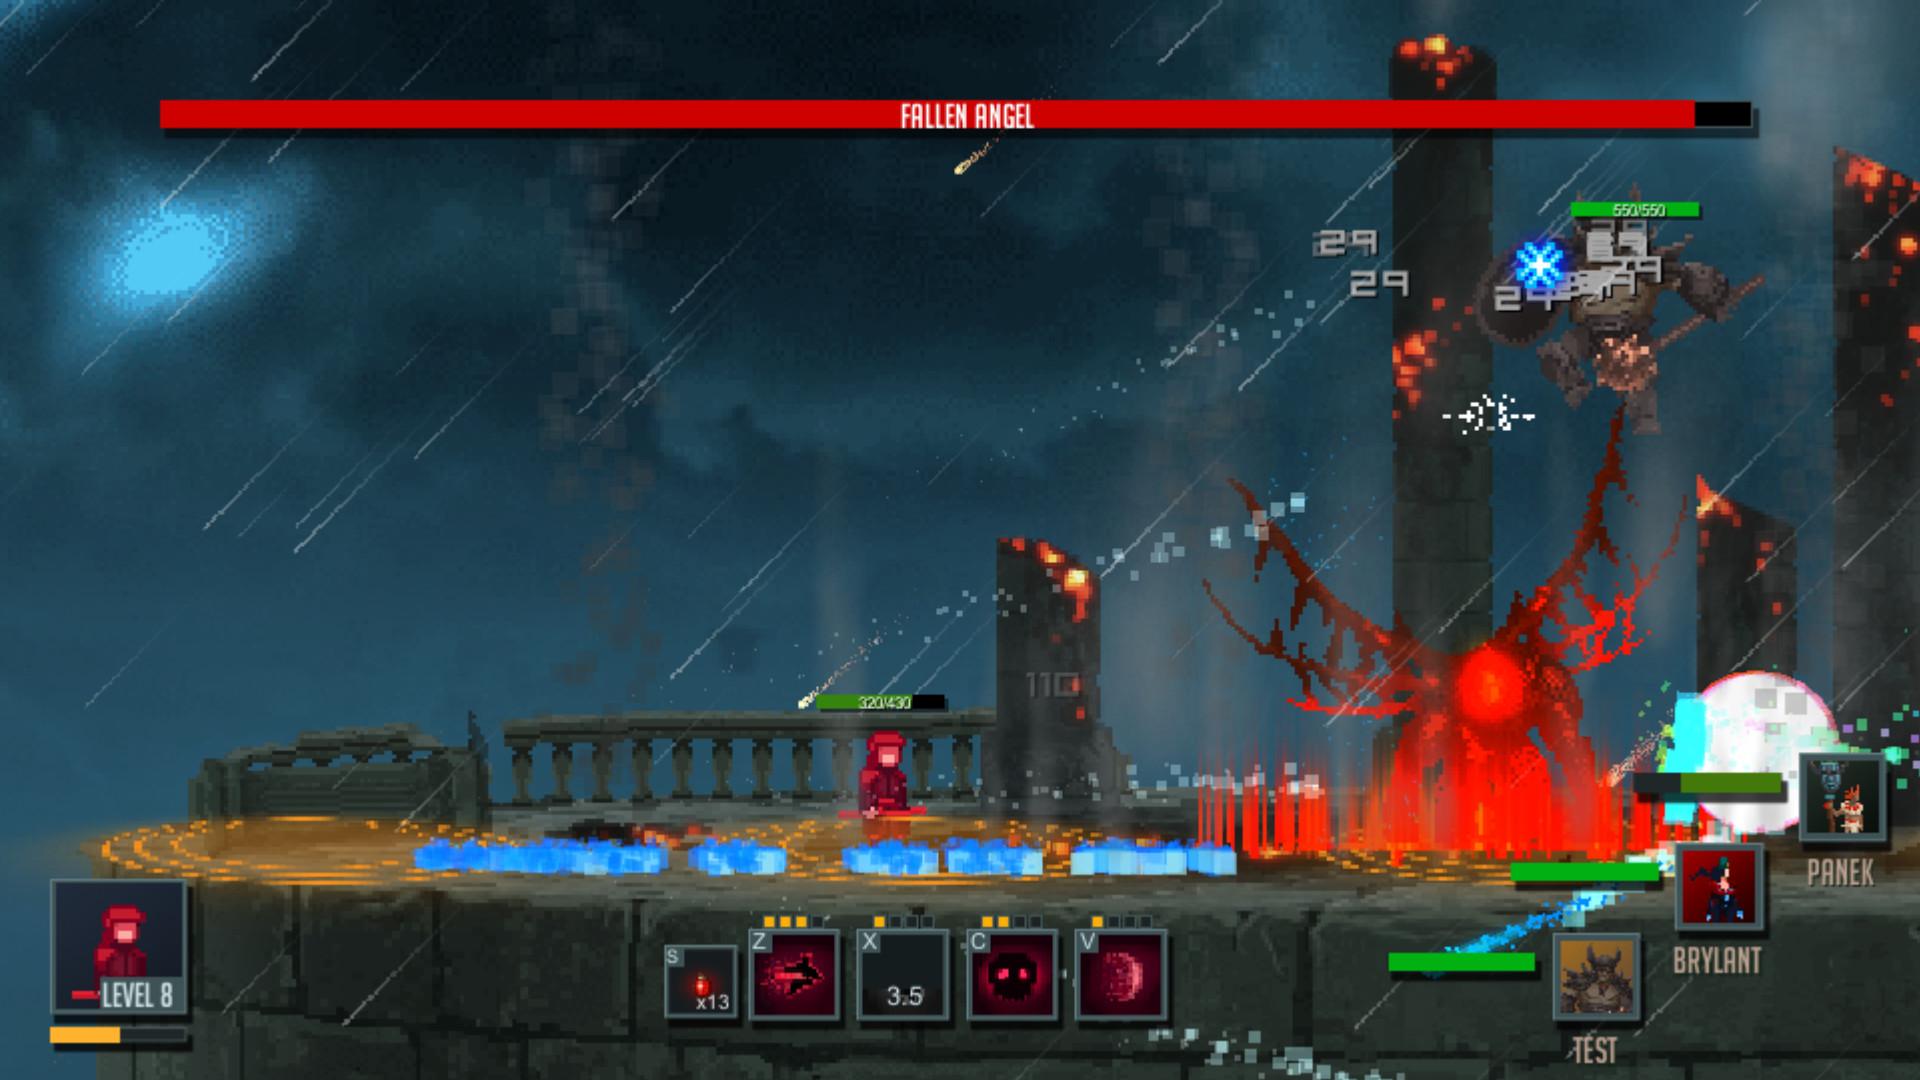 warlock vs shdaows 1004c